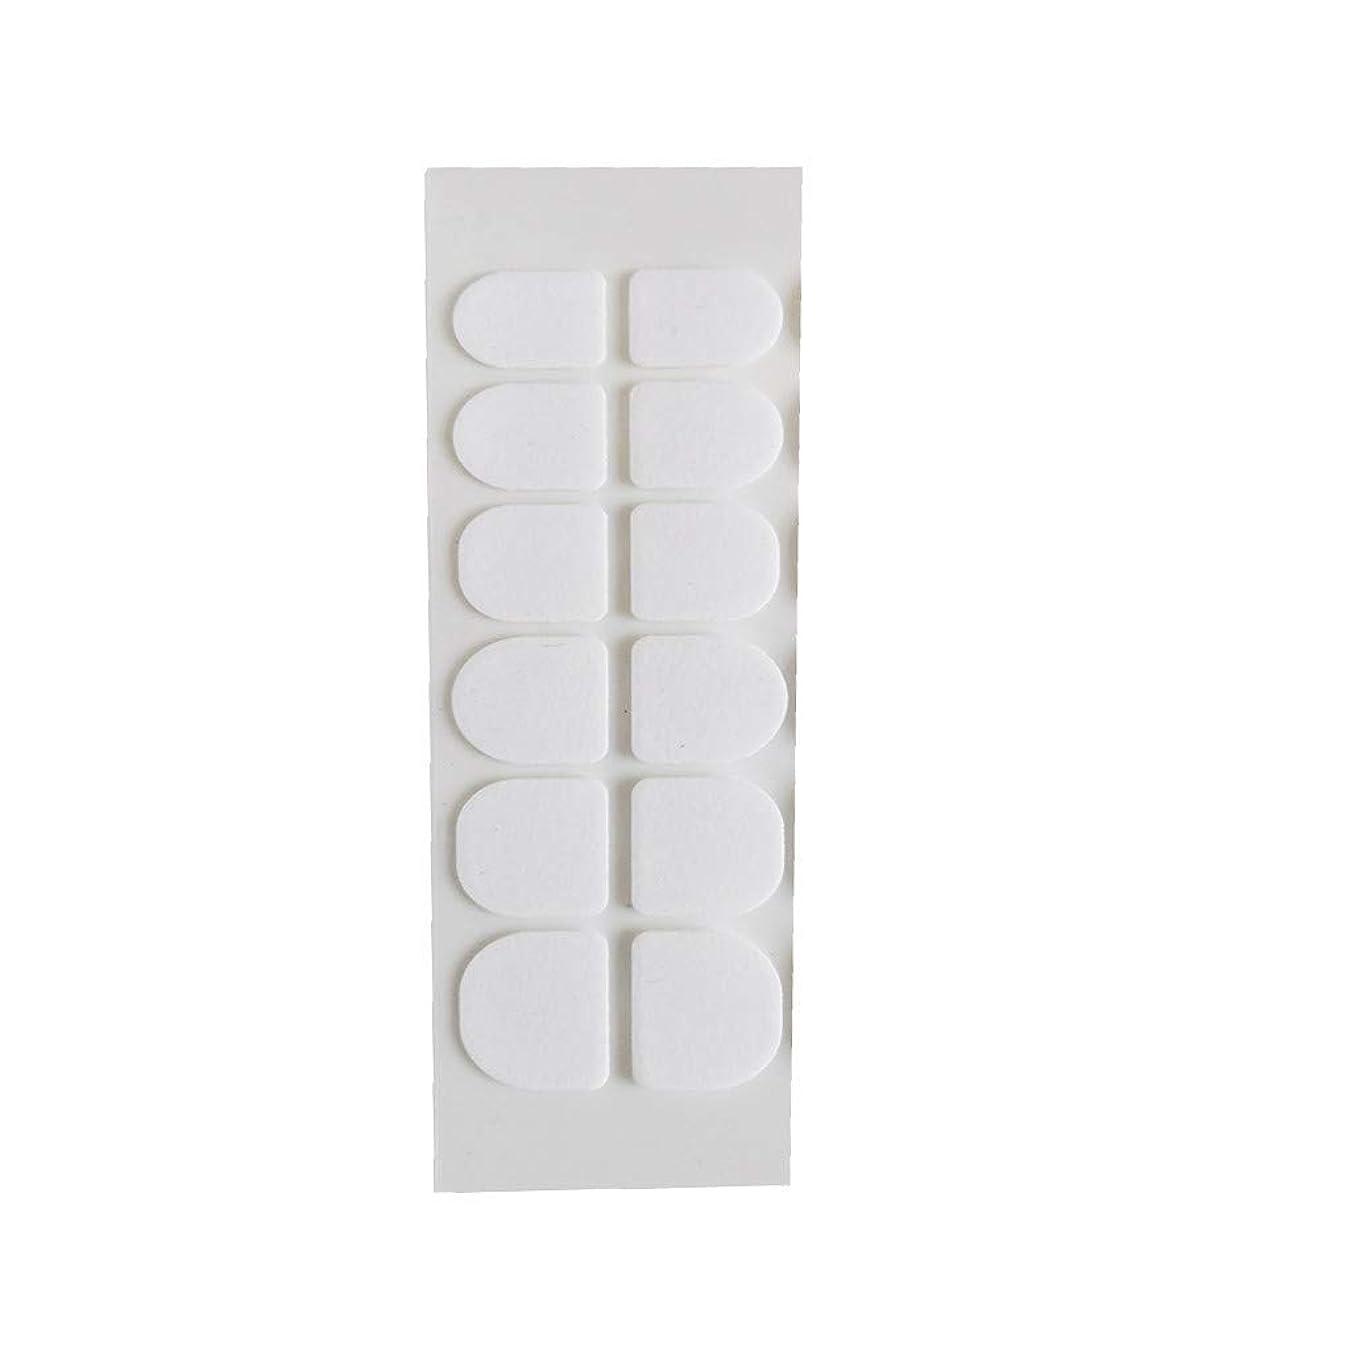 Posmant マニキュア 偽の爪 ゼリー 両面接着剤 環境に優しい 透明 目に見えない ネイルクリップ接着剤 ウェアラブルアーマー スーパースティッキー 透明 24個 5PCS 複数の色 選択できます 便利な